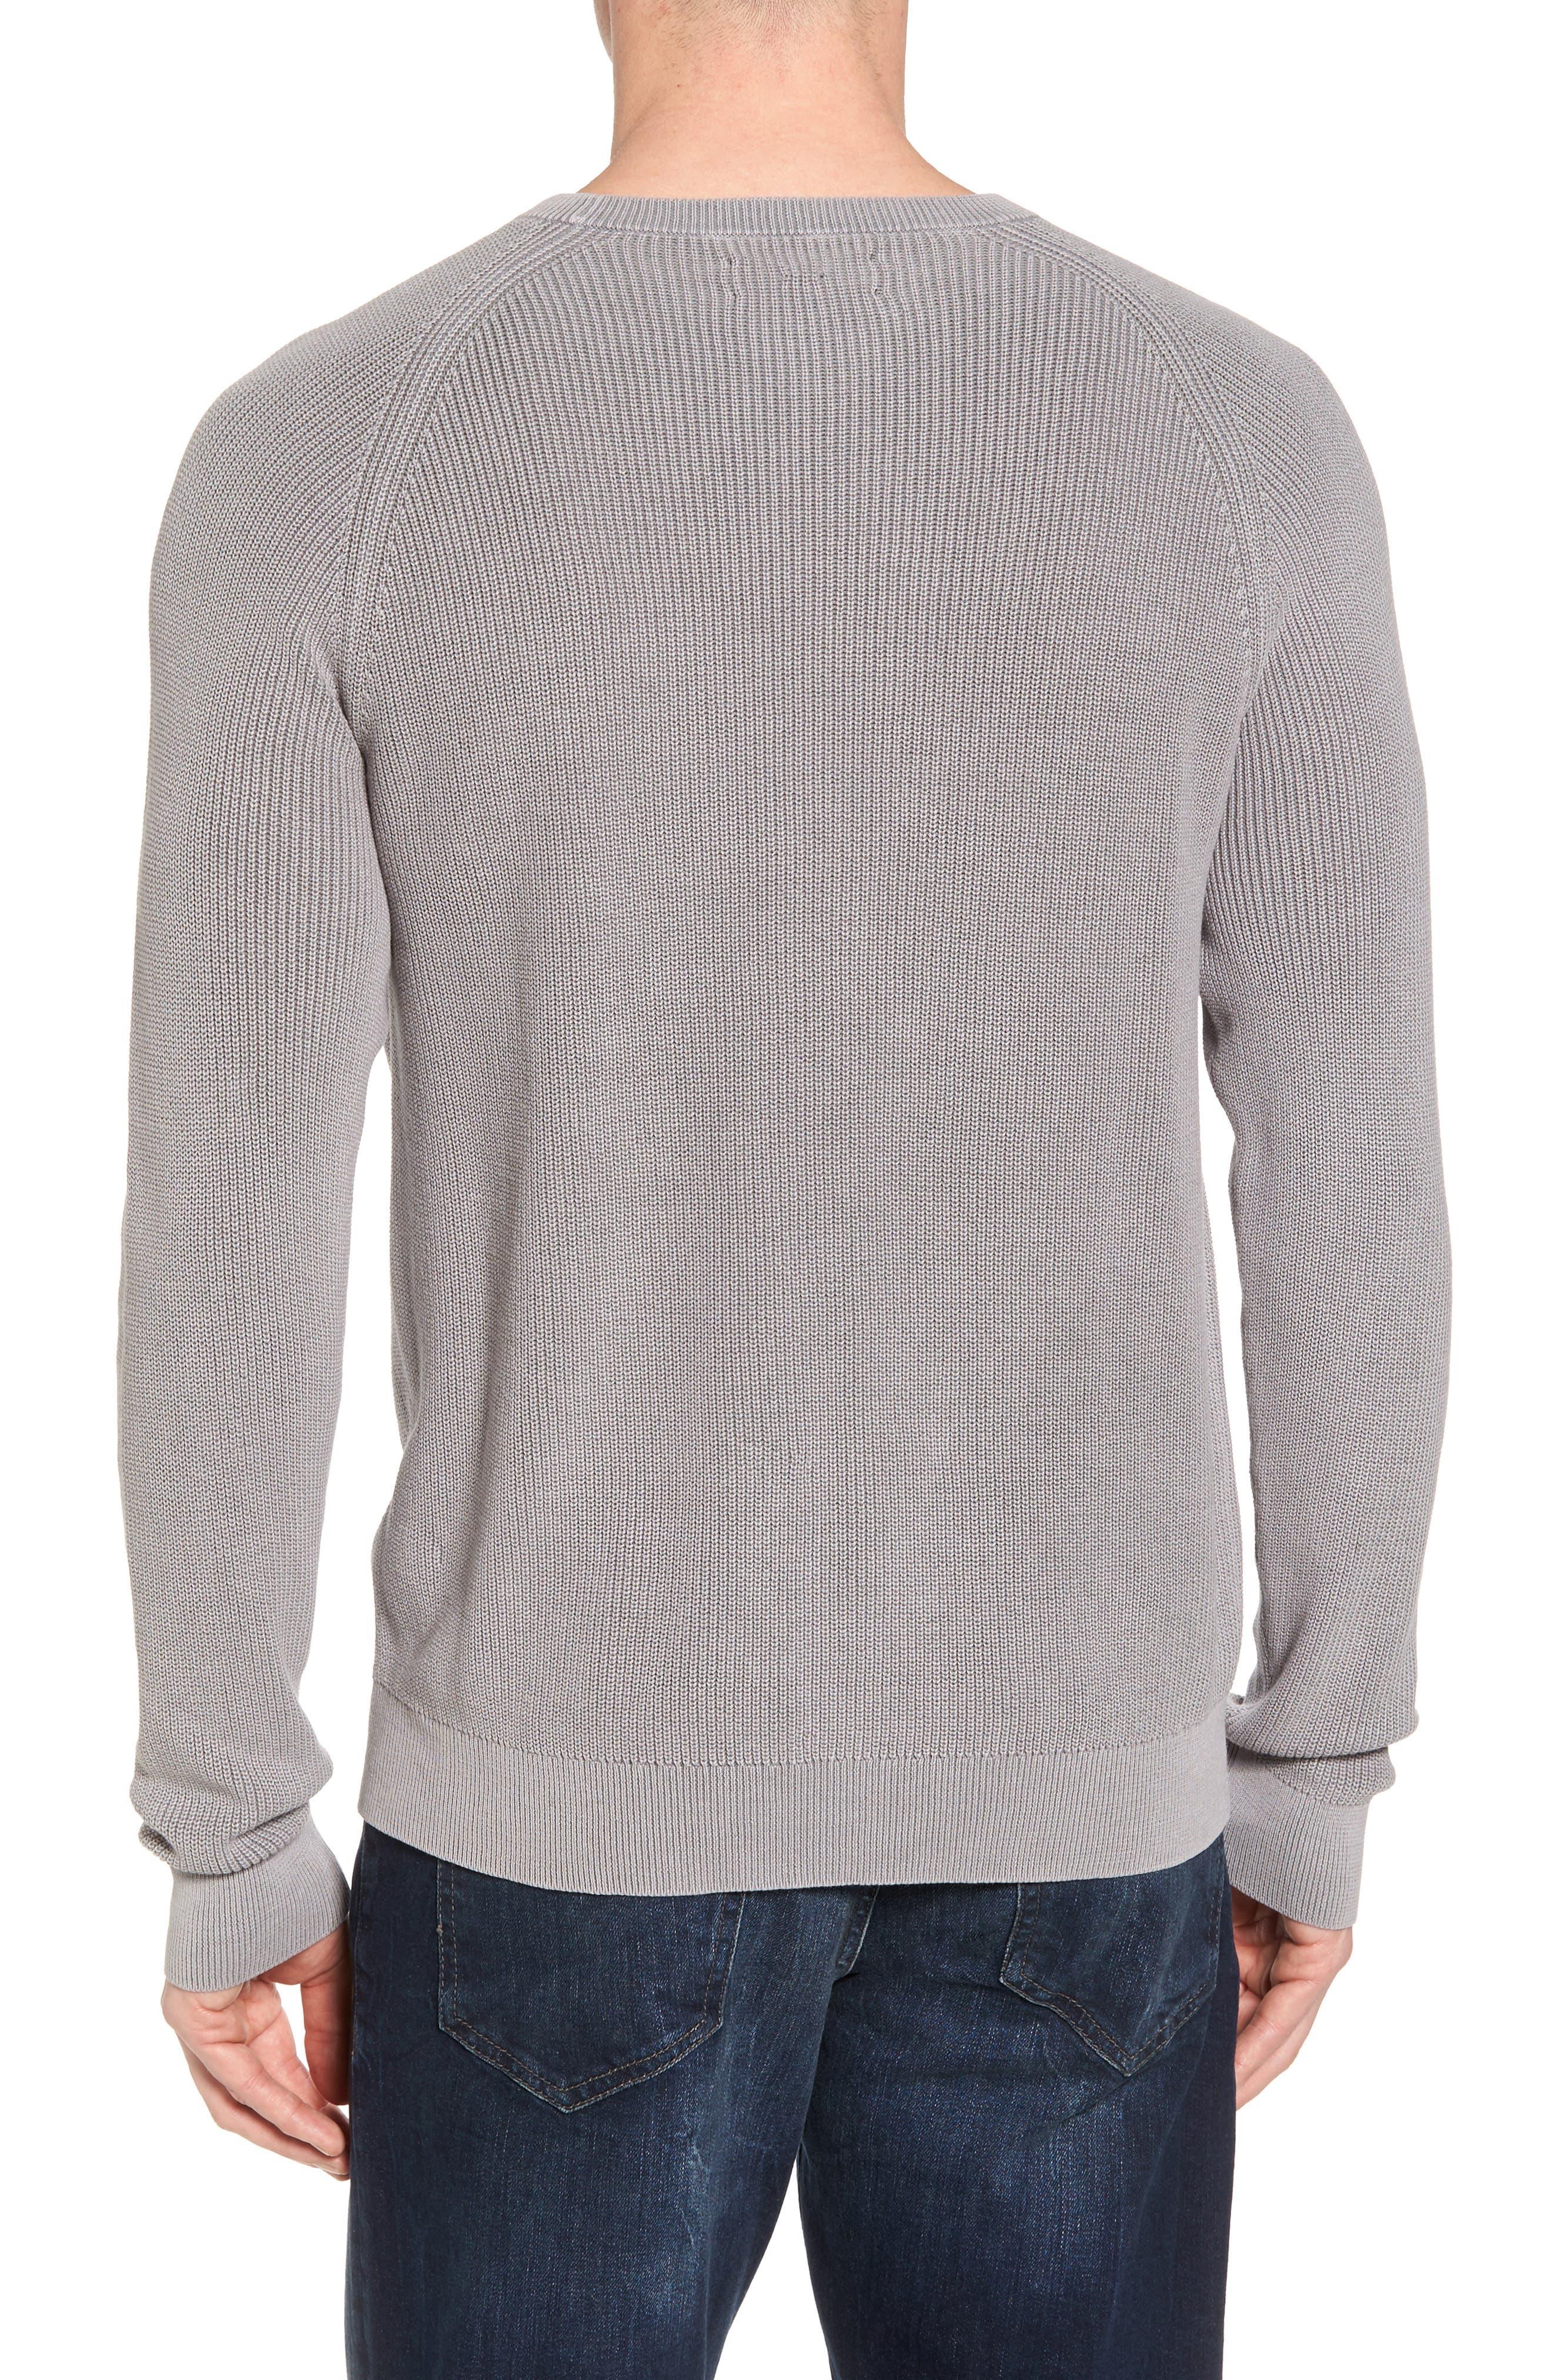 Crewneck Sweater,                             Alternate thumbnail 2, color,                             Grey Weather